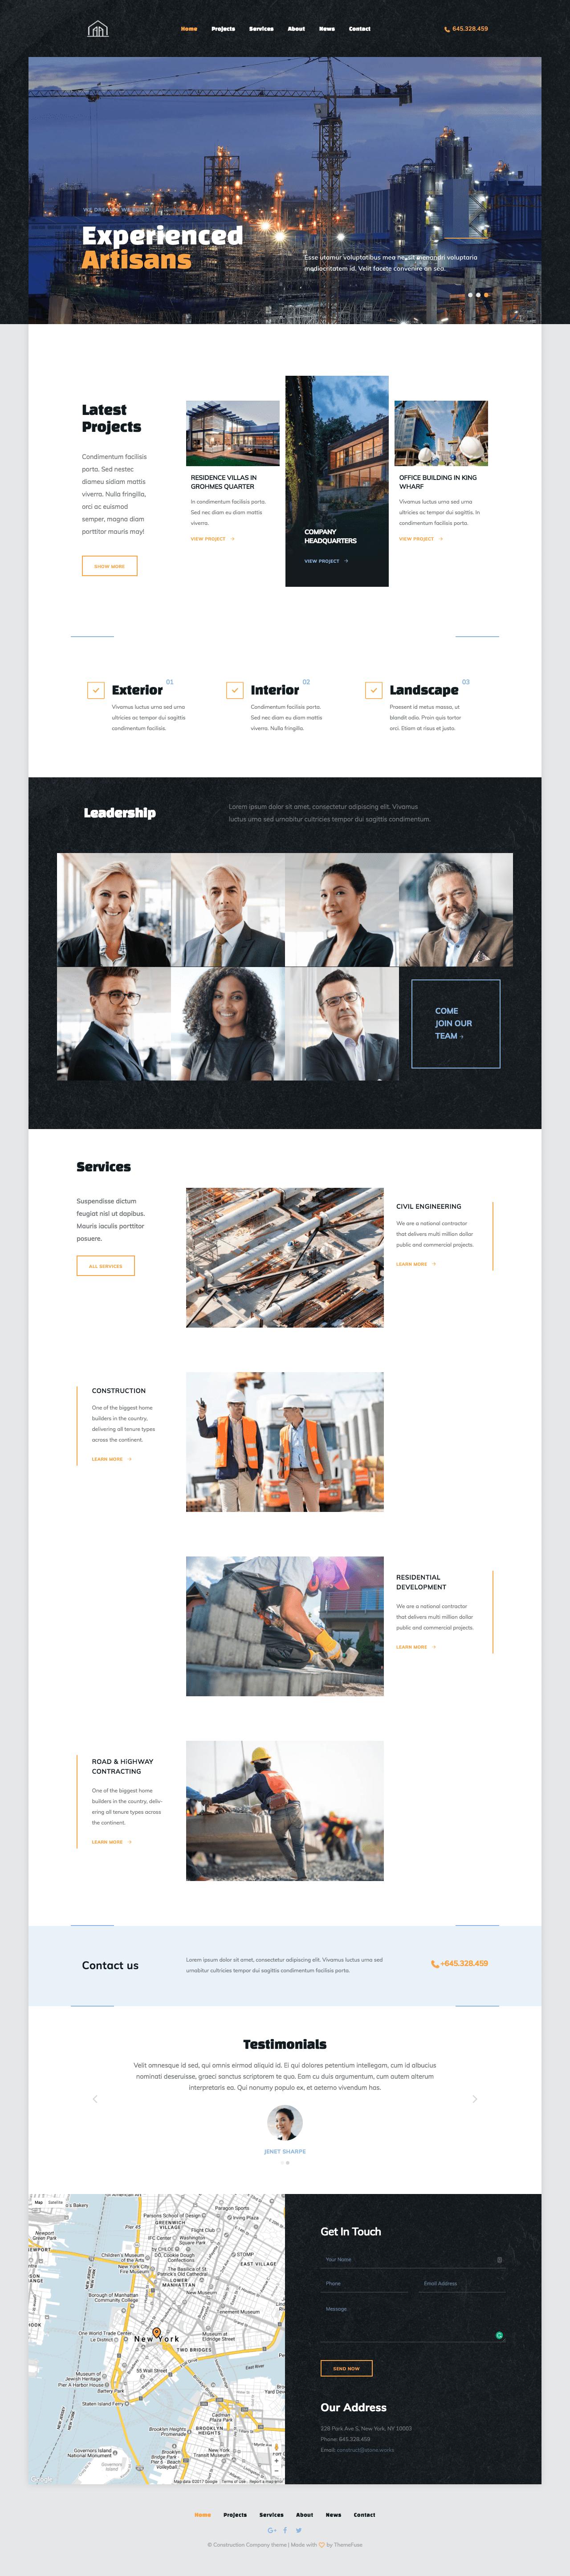 Build Out WordPress Theme